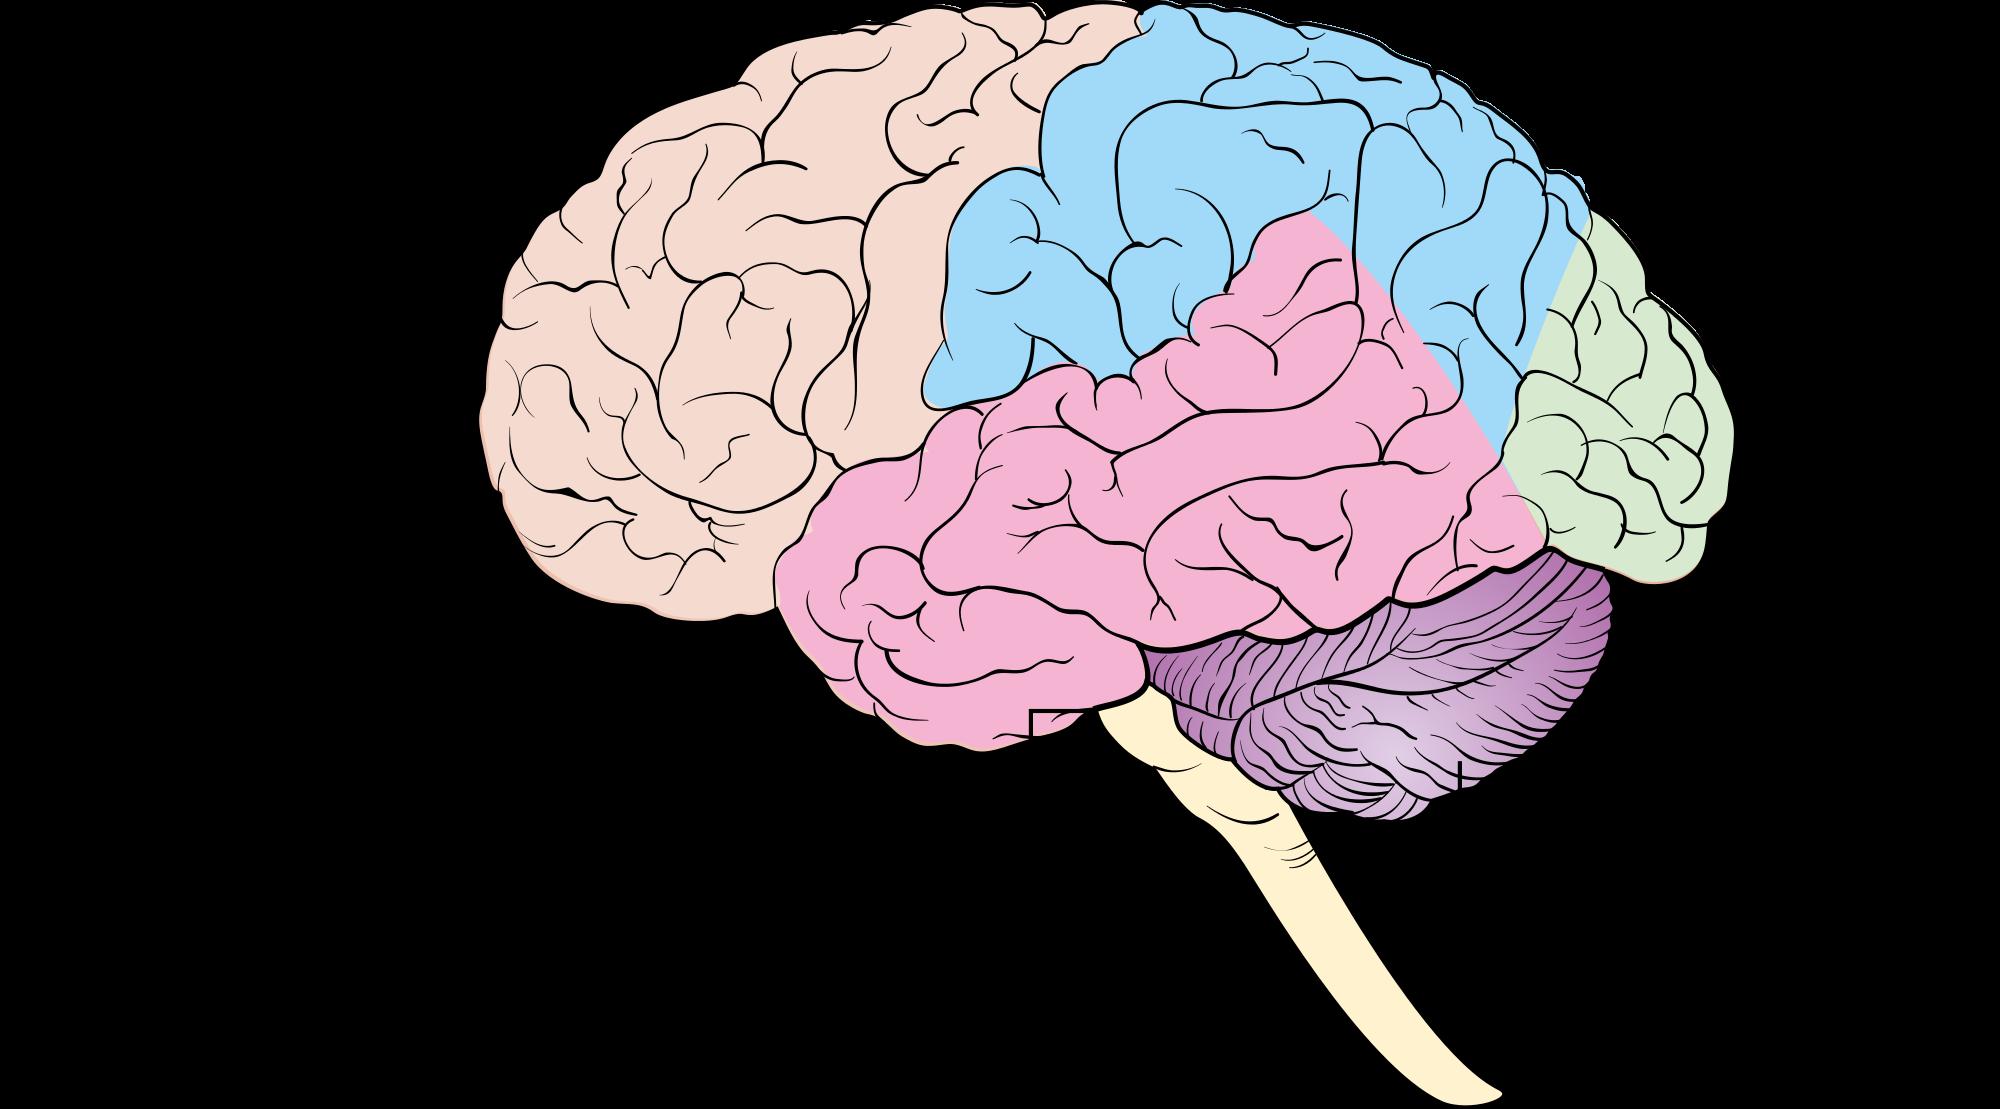 human brain wikipedia the free encyclopedia inspo. Black Bedroom Furniture Sets. Home Design Ideas